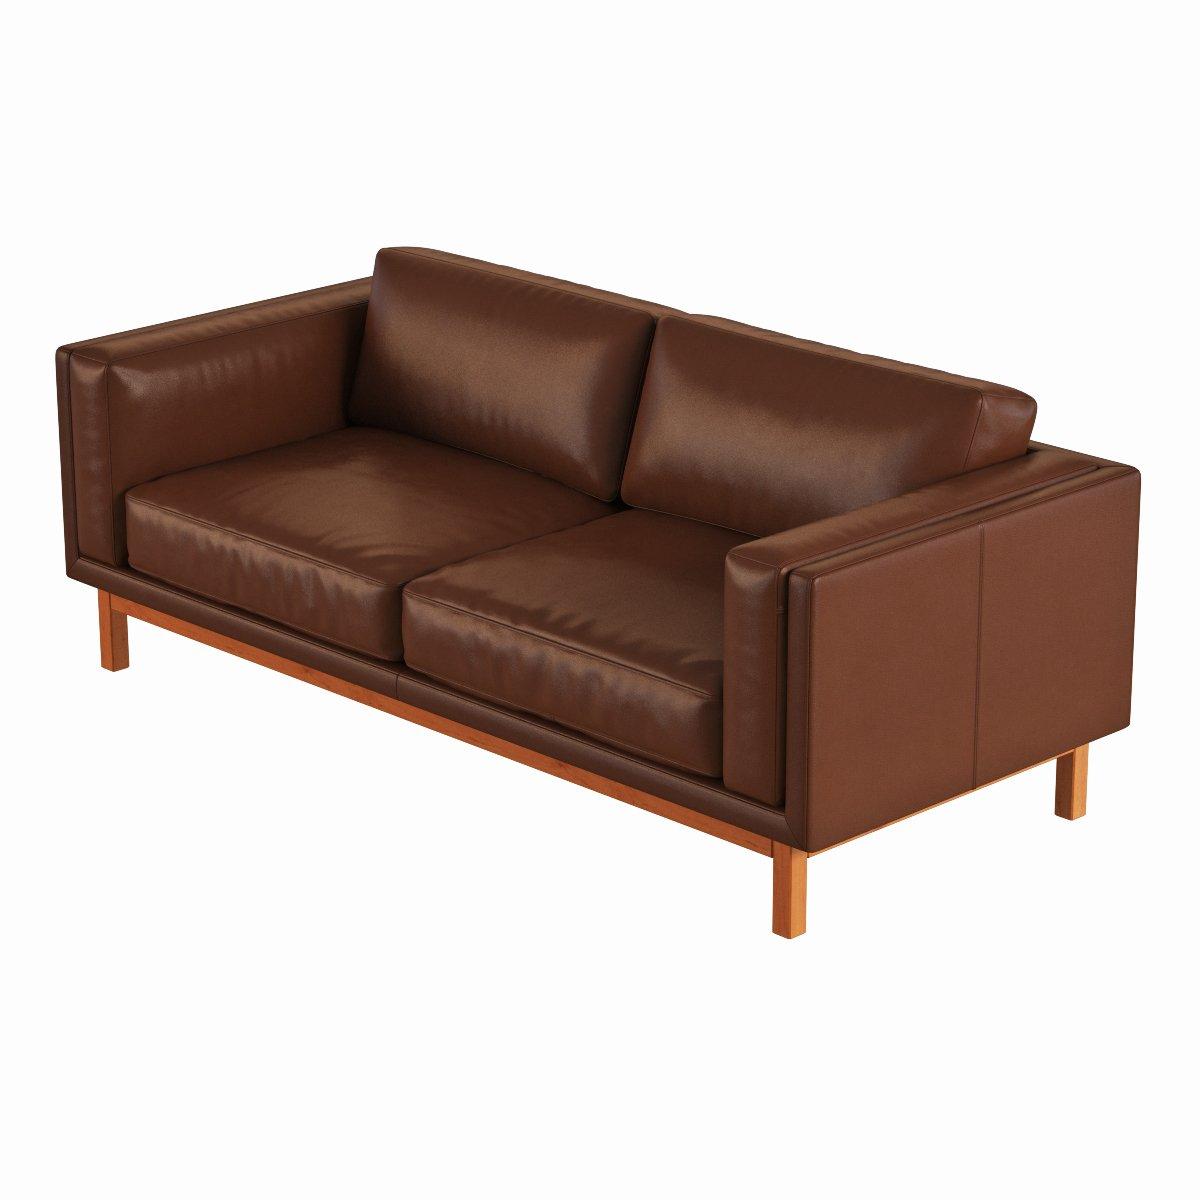 Dekalb Leather Sofa Remove Bookmark This Item